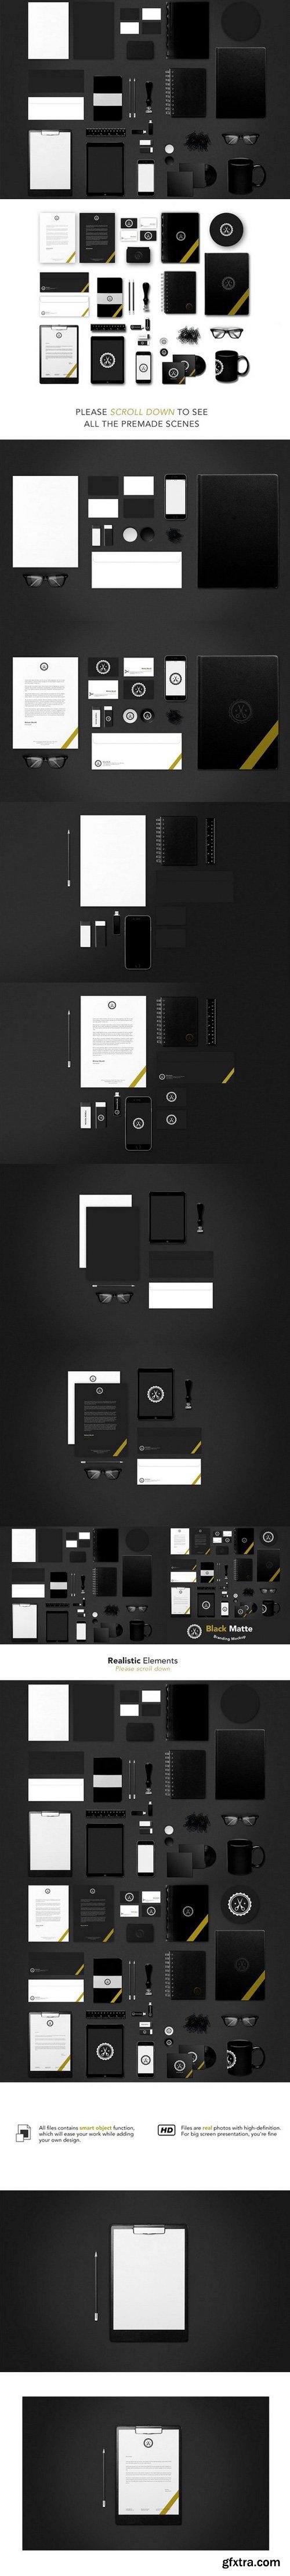 CM - Corporate Identity Design Mockup 262687